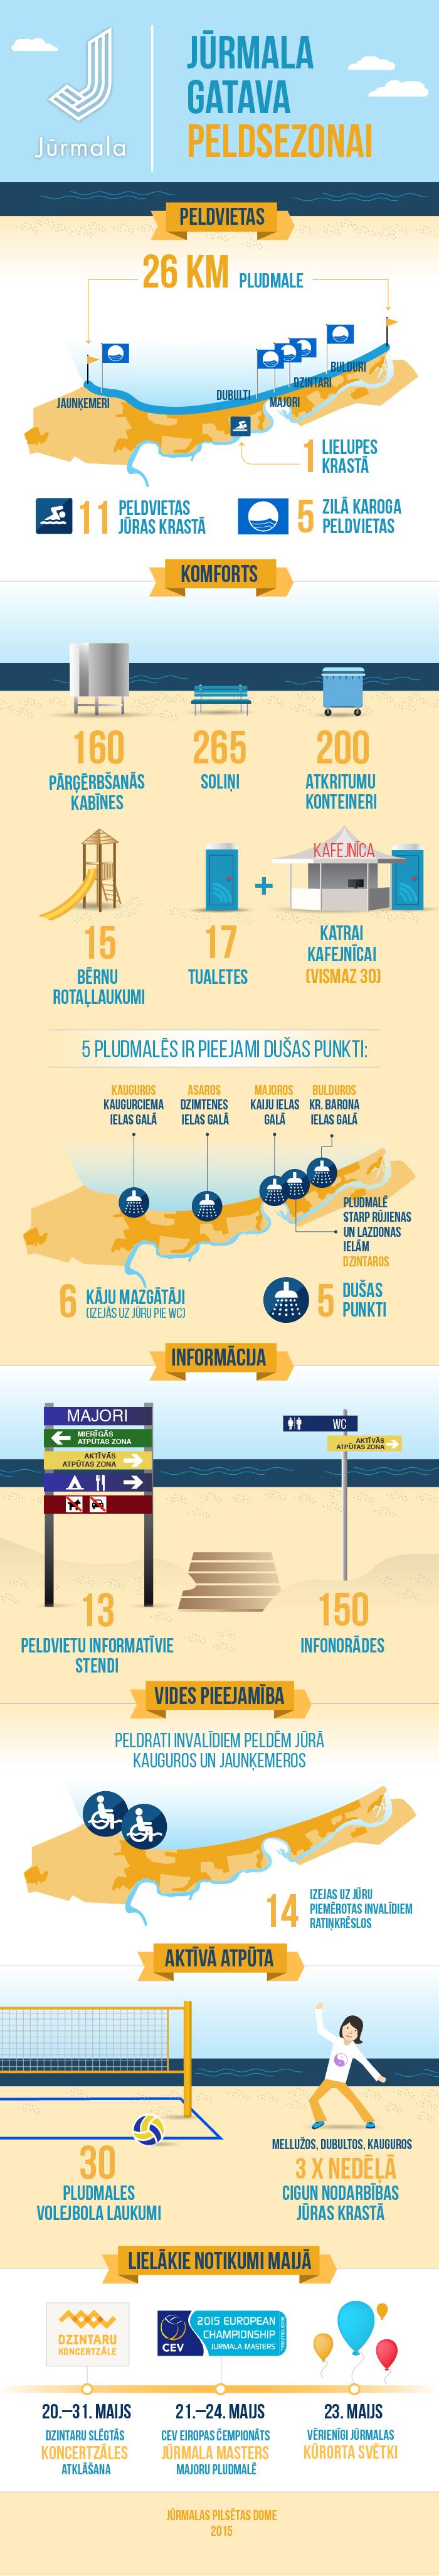 Infografika: Jūrmala gatava peldsezonai